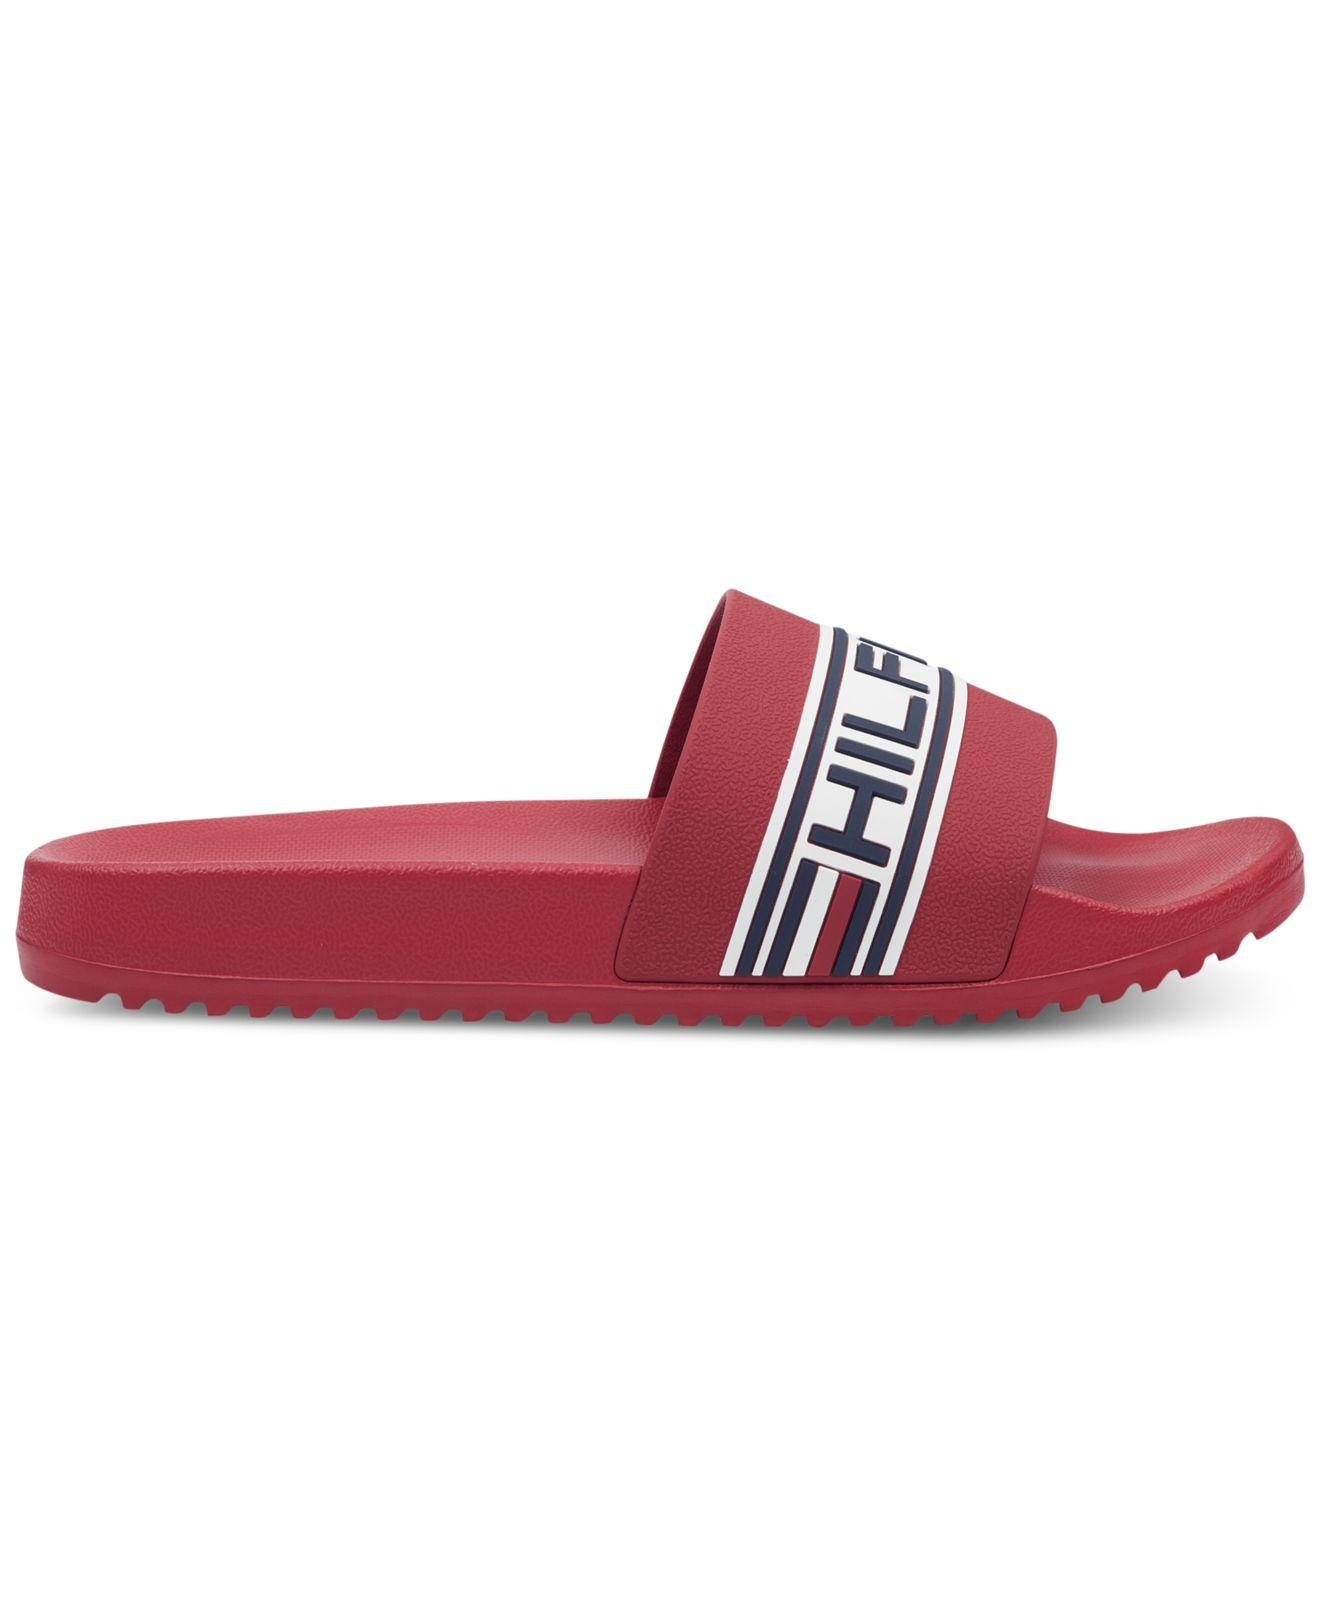 657391db6e6 Lyst - Tommy Hilfiger Rustic Slide Sandals in Red for Men